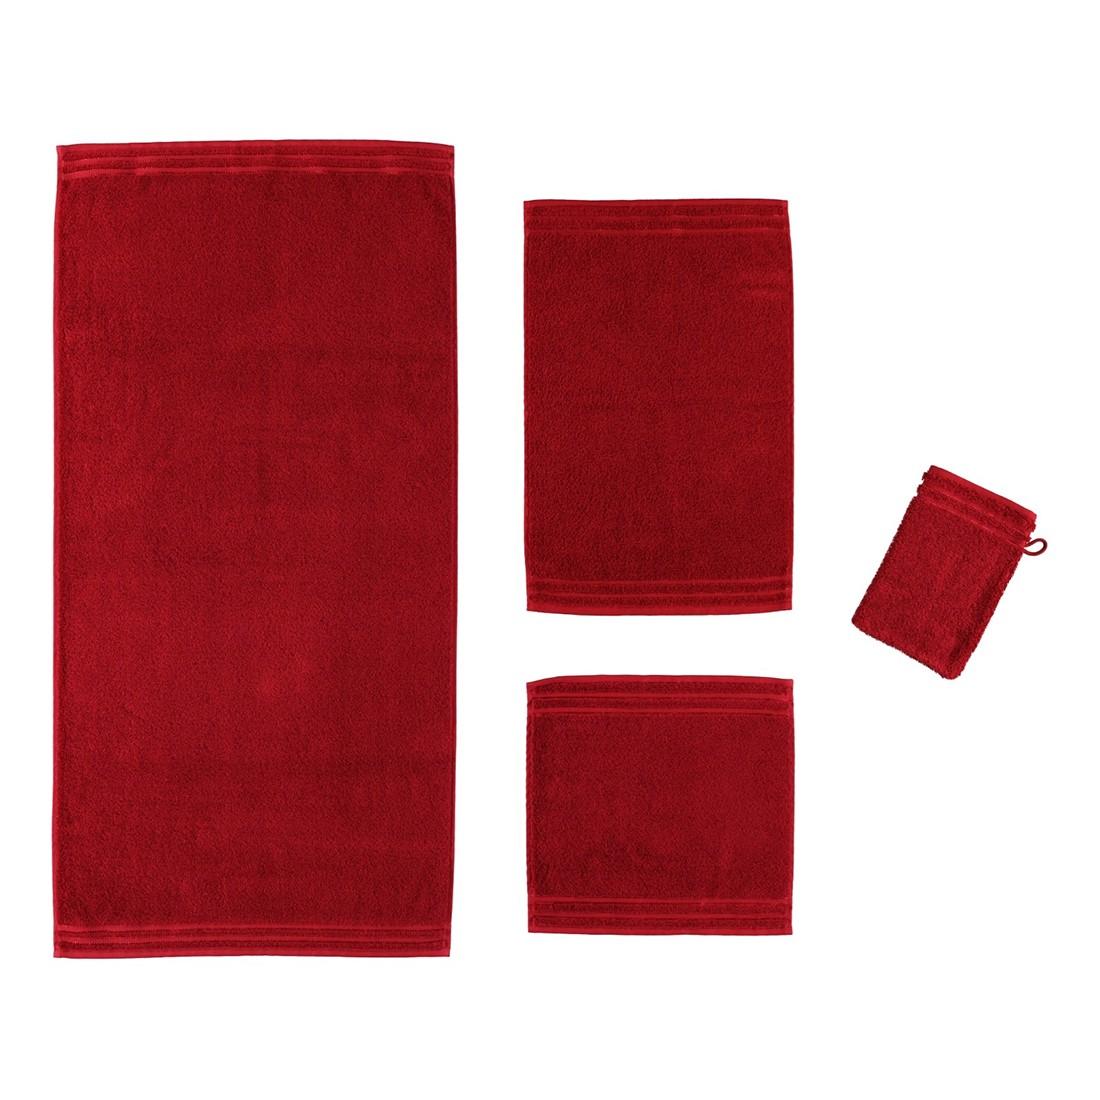 Handtuch Calypso Feeling – 100% Baumwolle rubin – 390 – Duschtuch: 67×140 cm, Vossen günstig bestellen